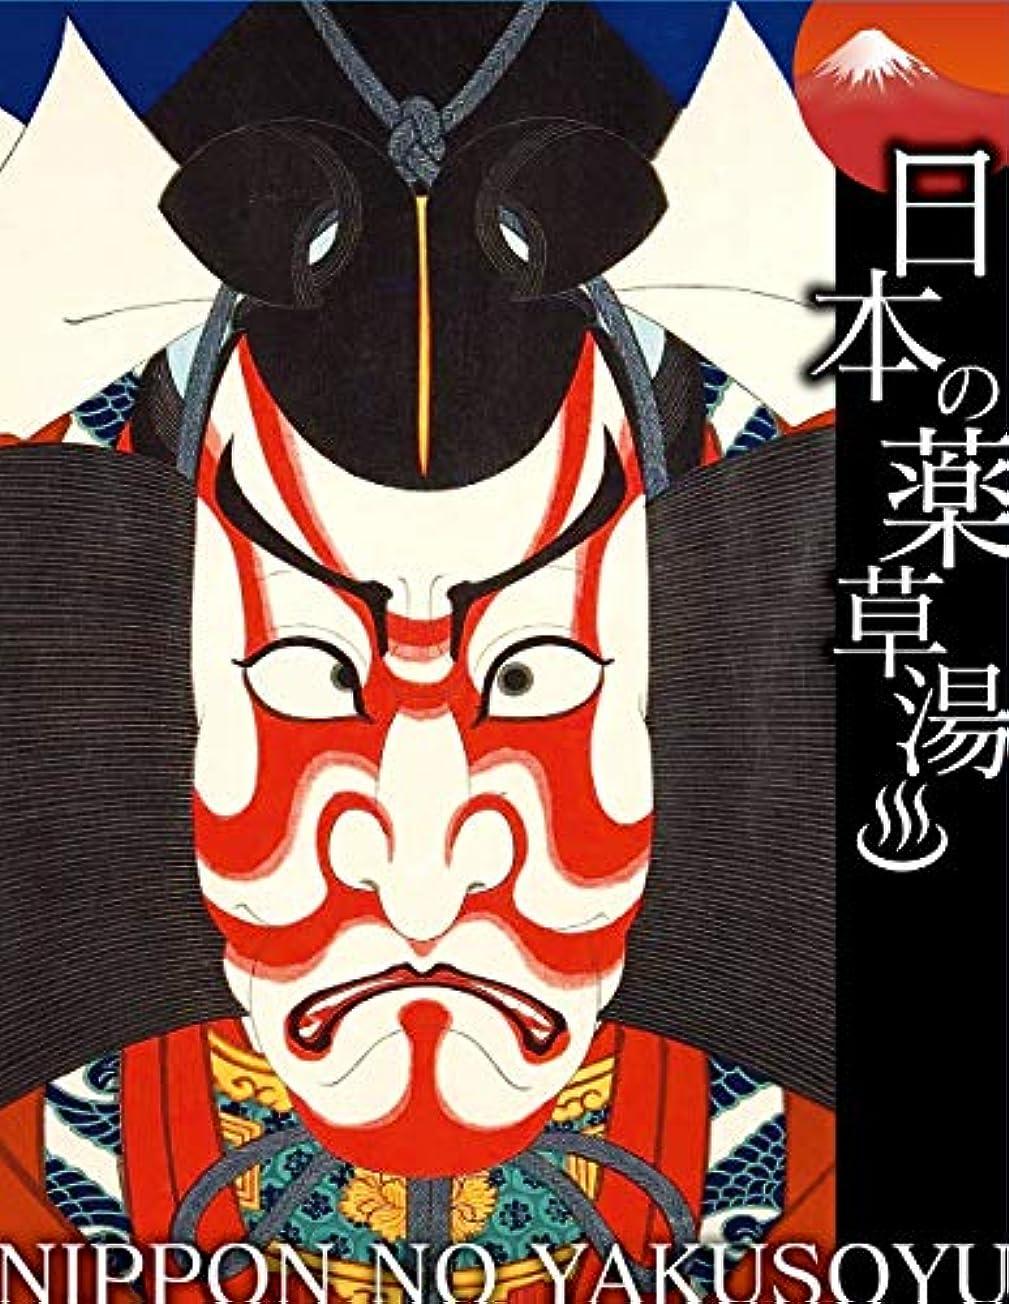 閉じ込める頭抽象日本の薬草湯 碓井荒太郎貞光 市川海老蔵 二九亭白猿